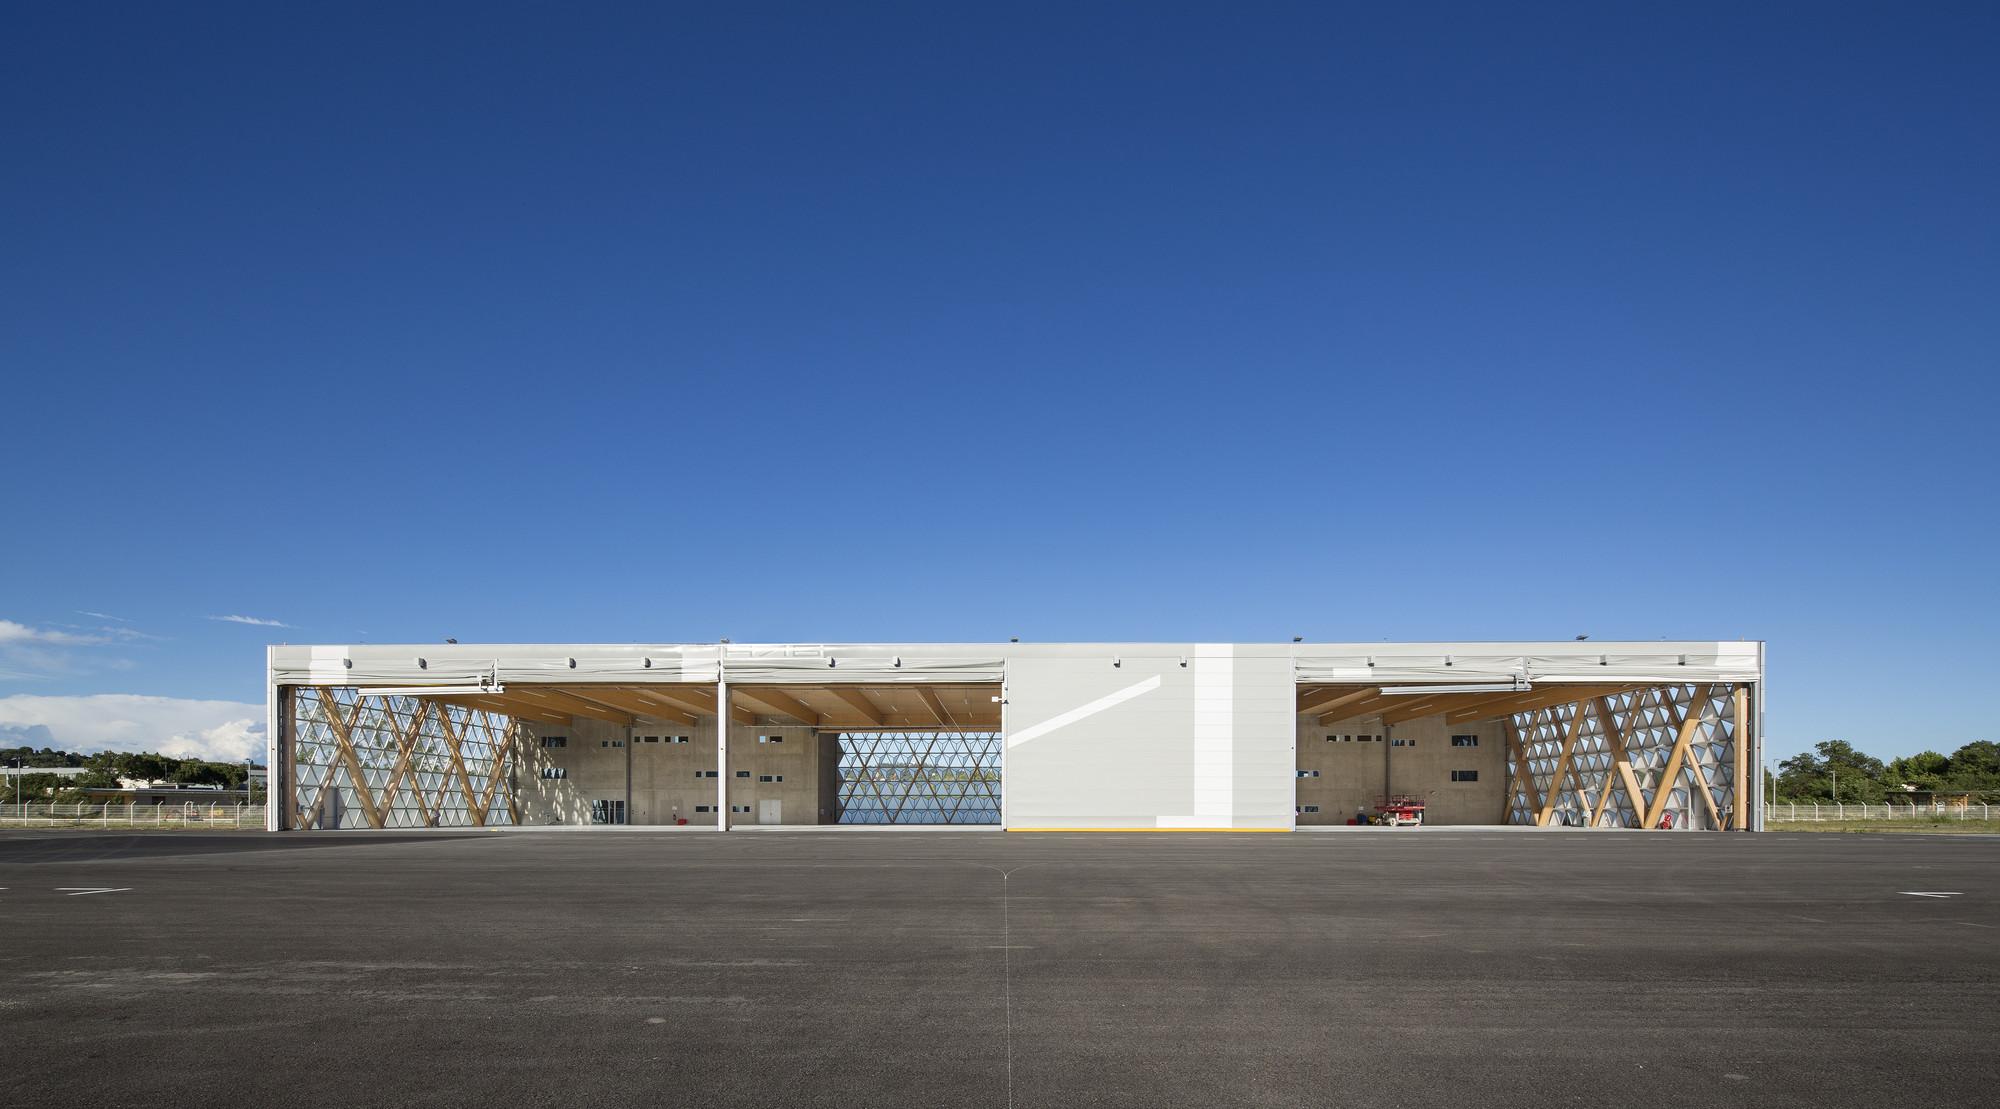 Gallery of hangar h16 comte vollenweider architectes 8 for Architecture hangar